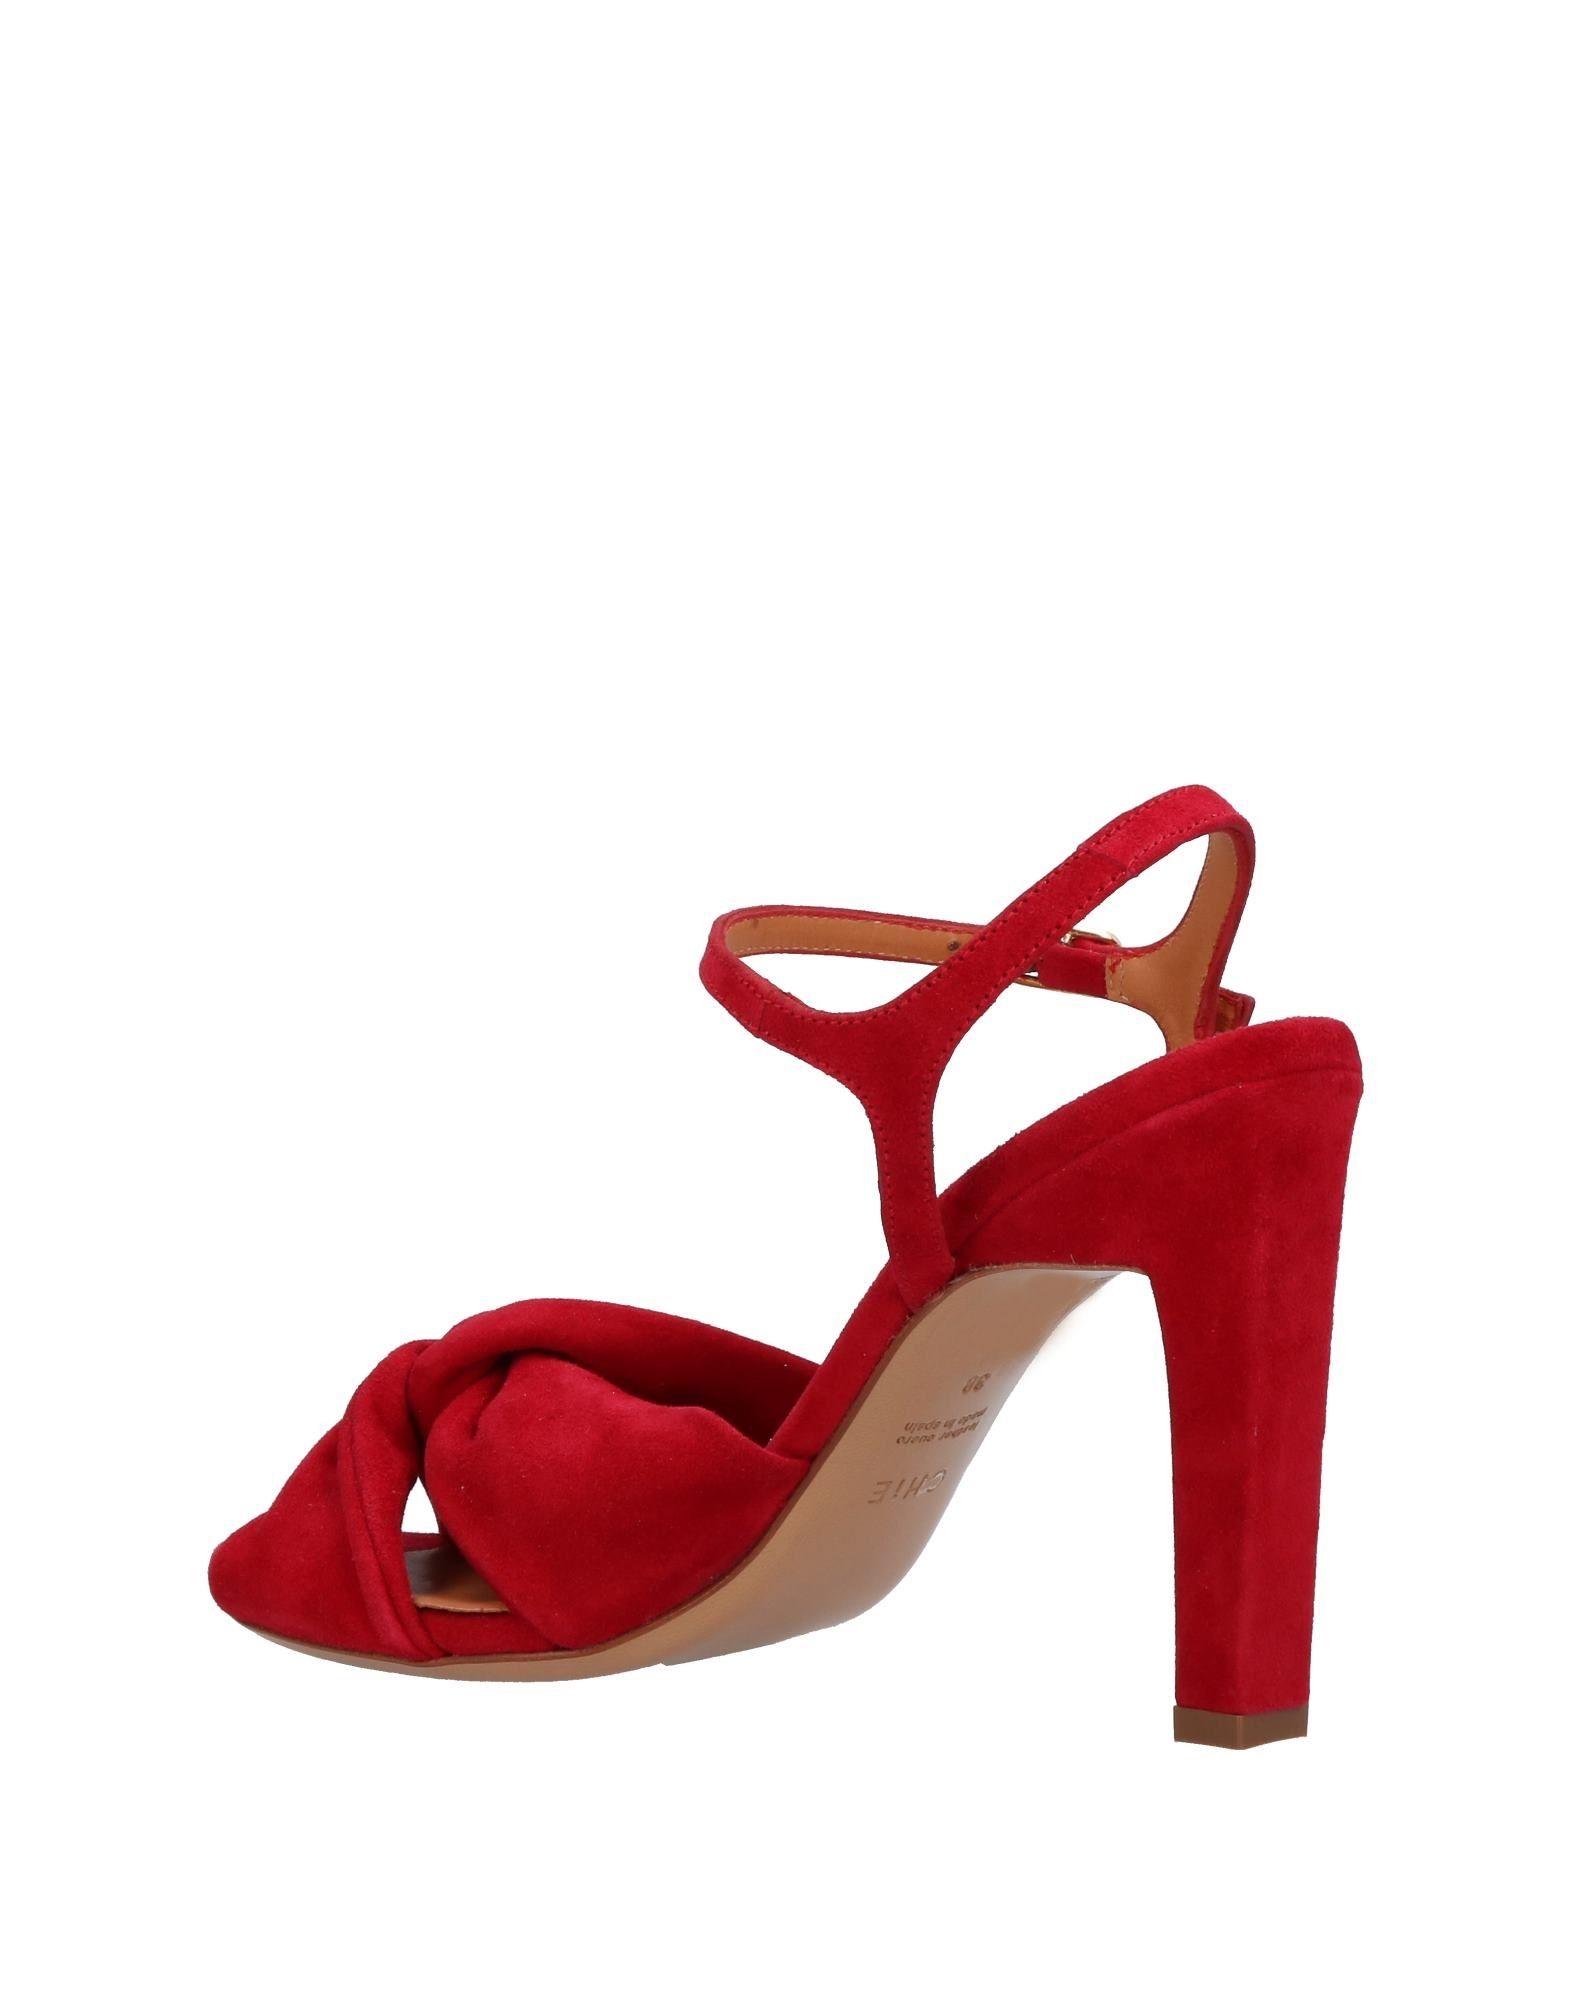 Sandales Chie By Chie Mihara Femme - Sandales Chie By Chie Mihara sur